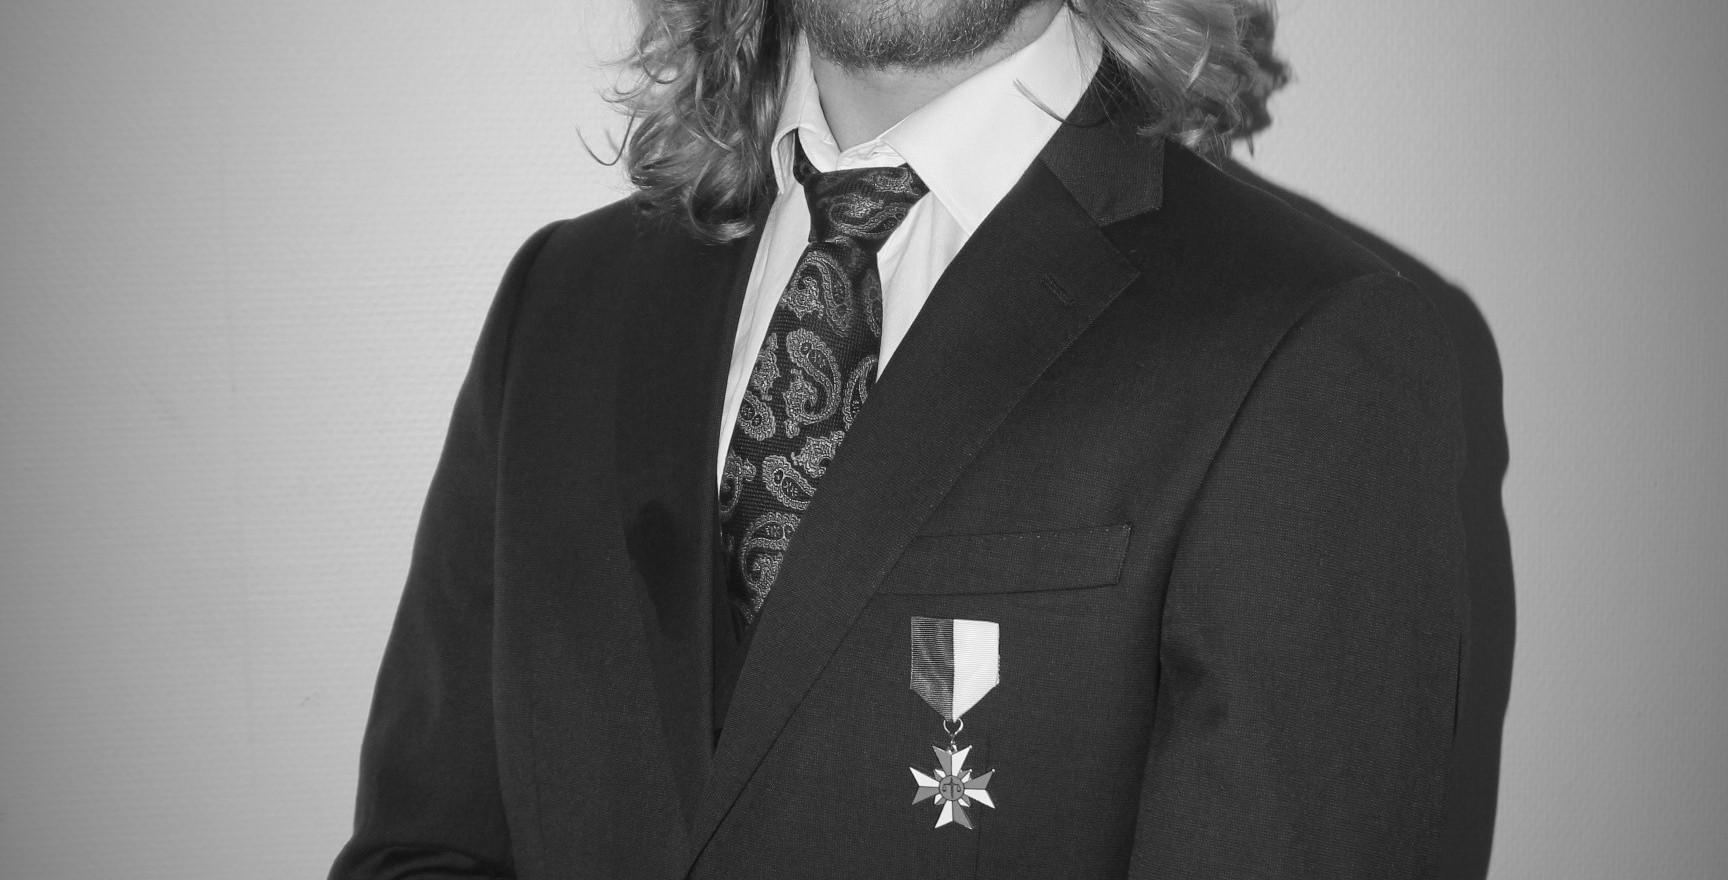 Nicolas Kitzler